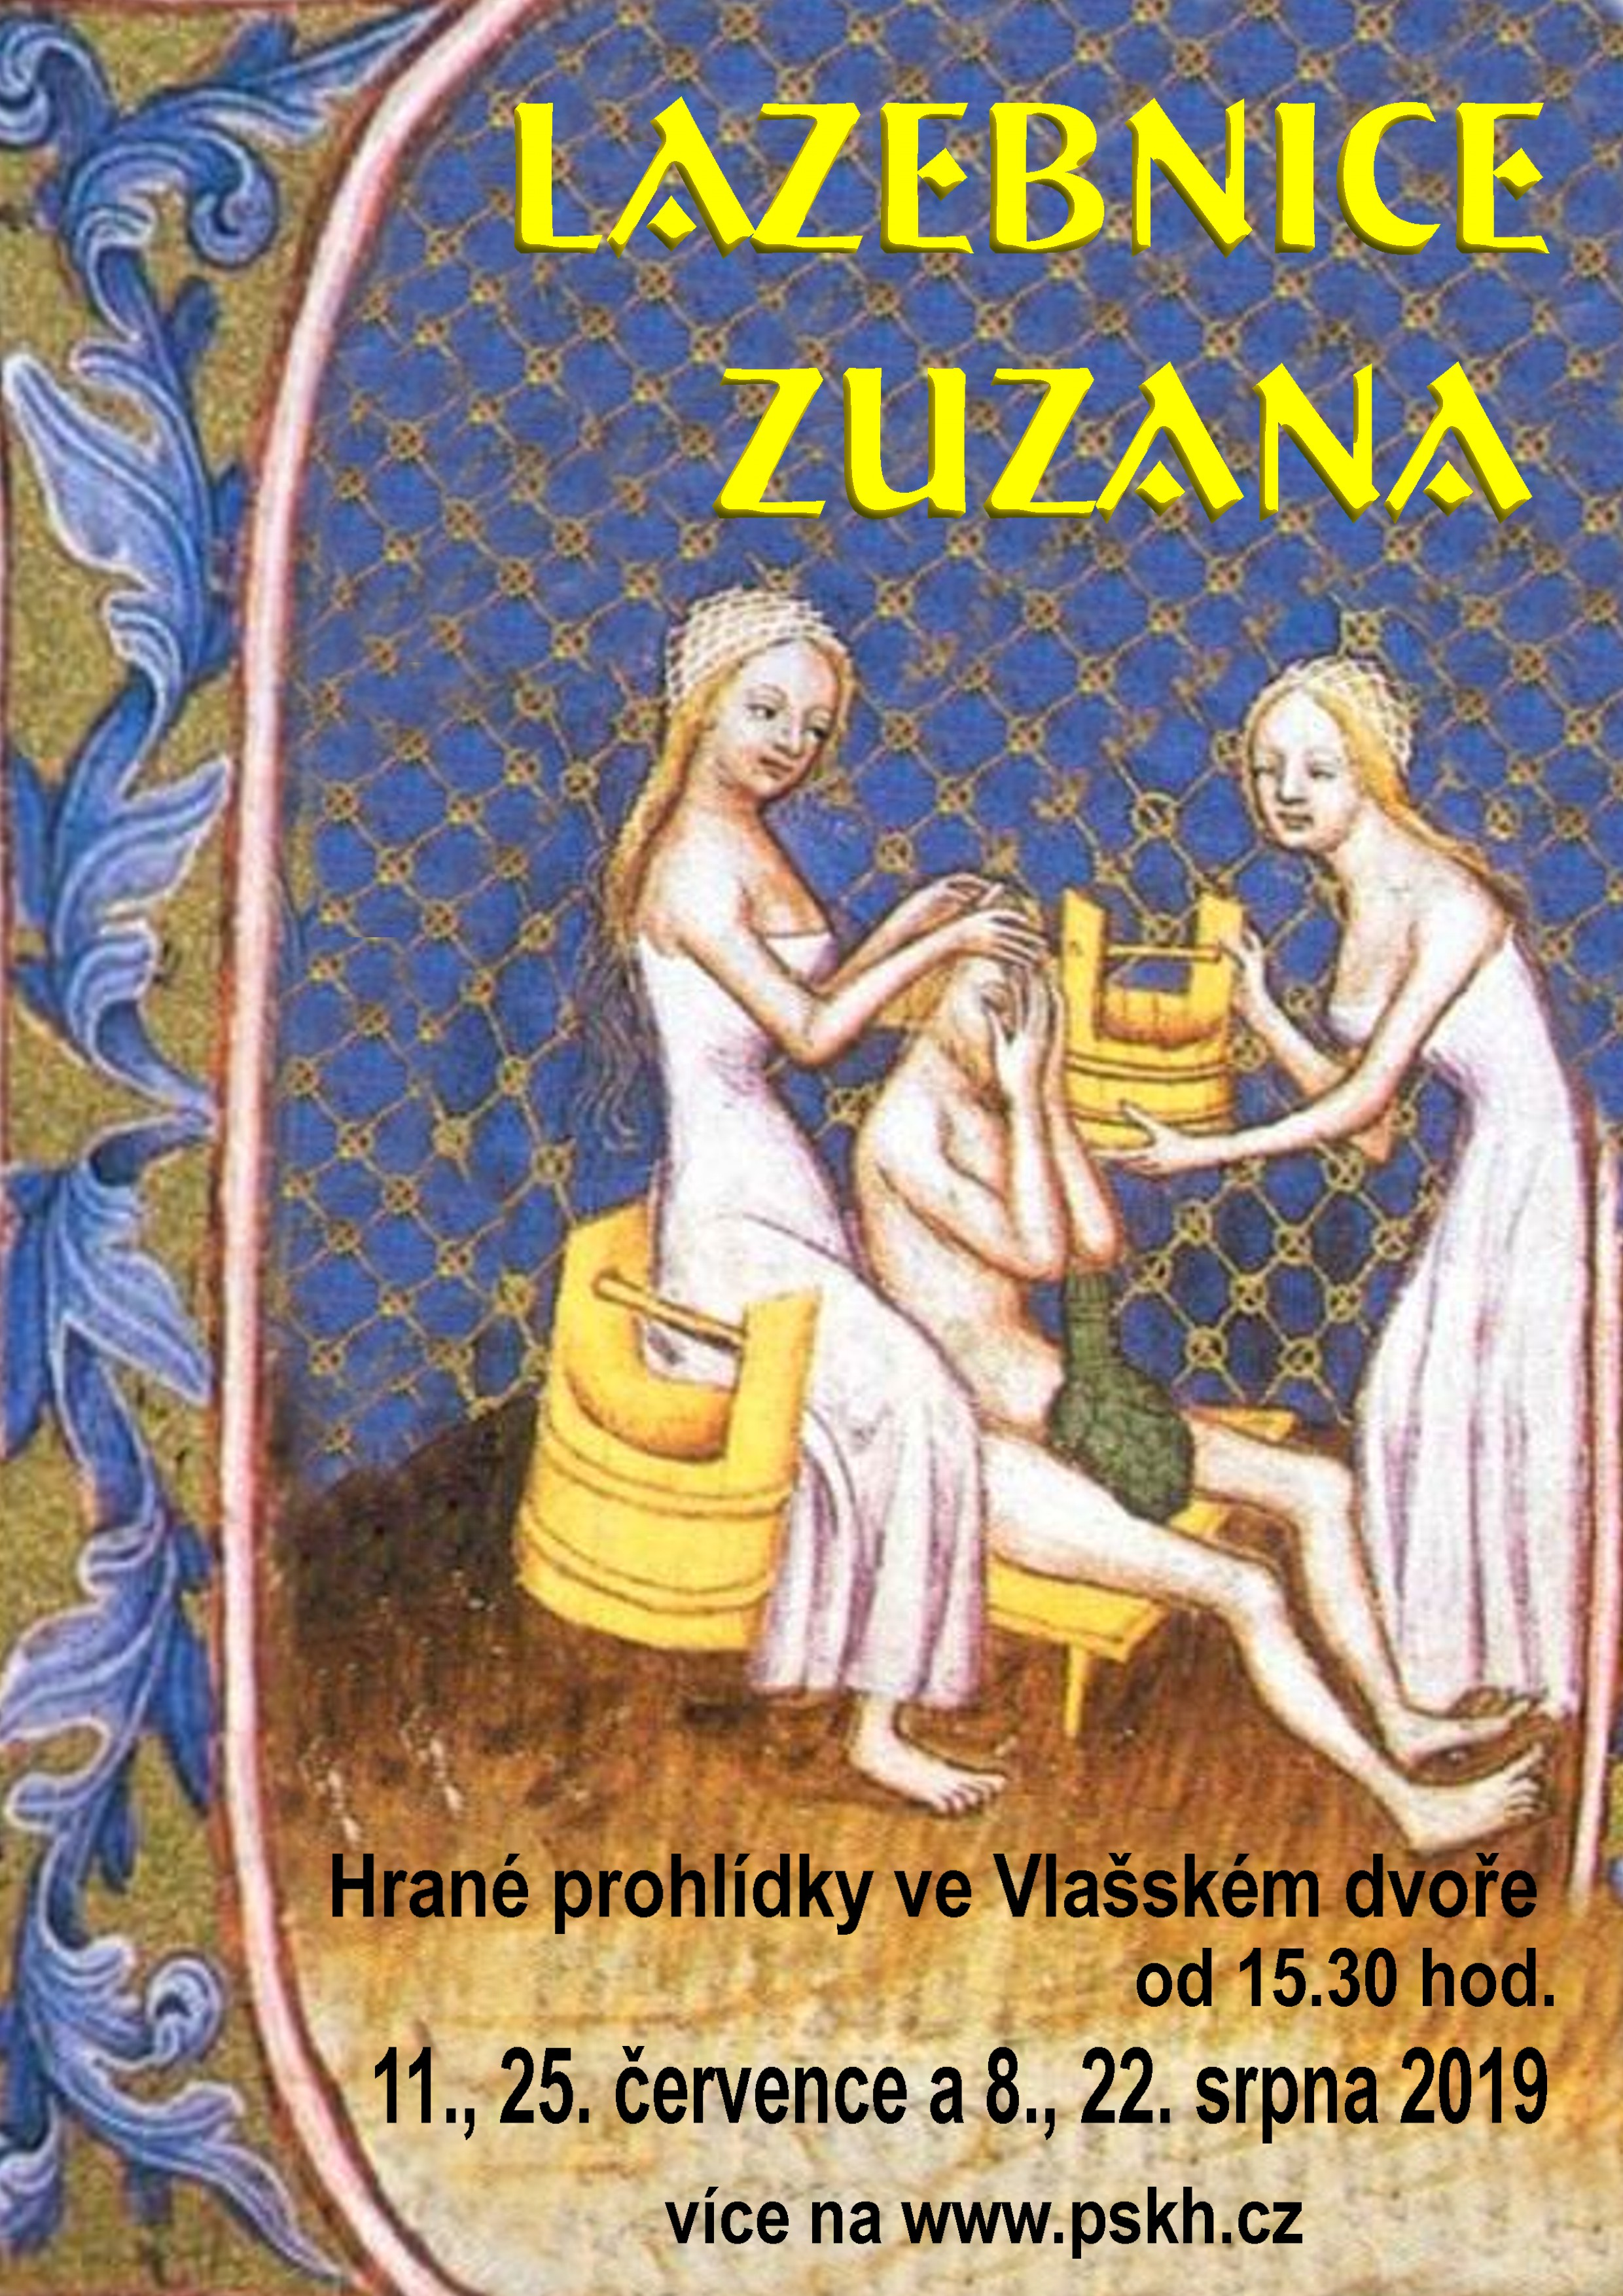 6393-lazebnice-zuzana-2019.jpg